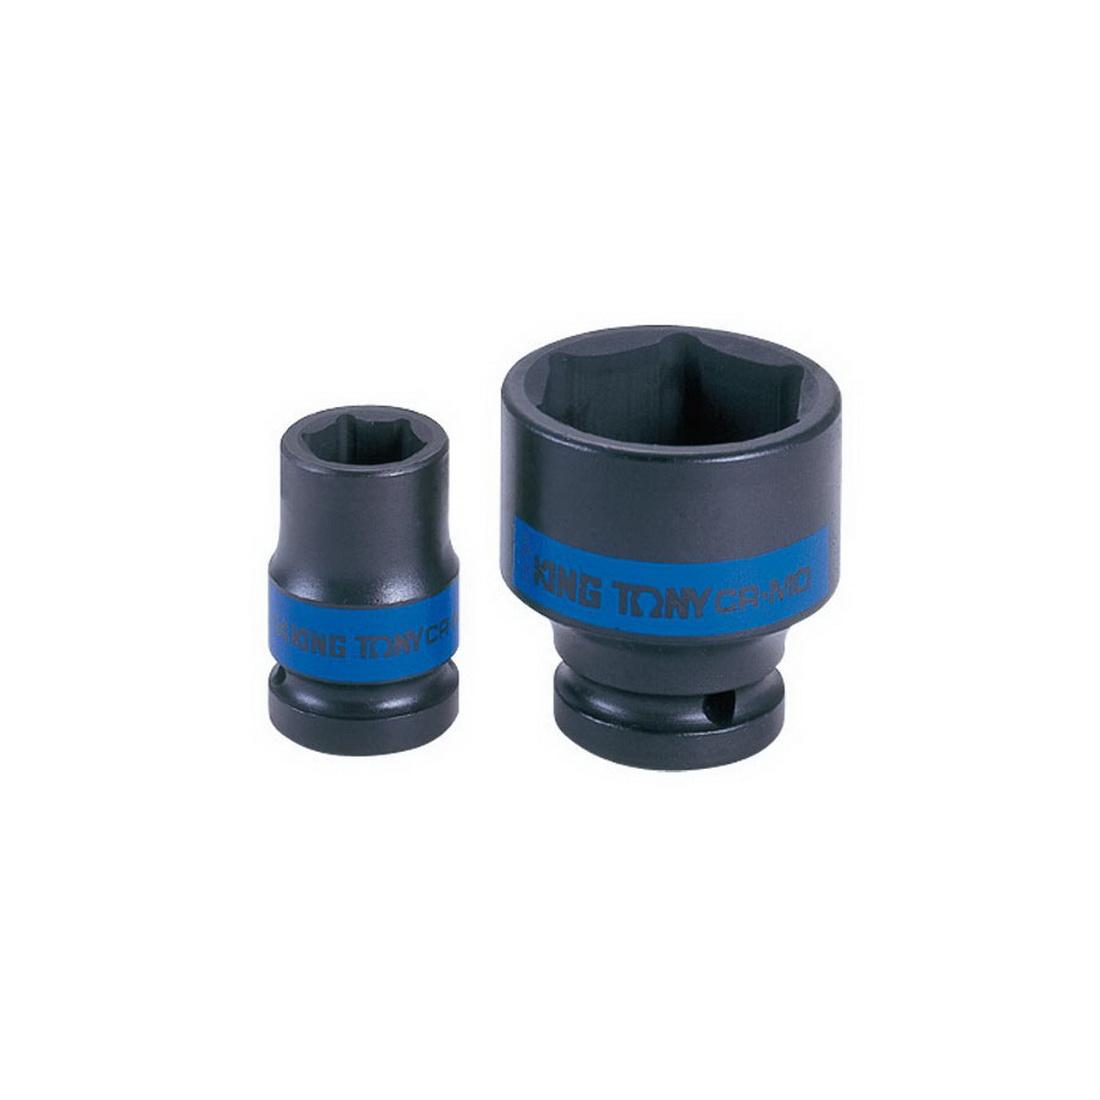 10mm 1/2 Inch Drive 6-Point Standard Impact Socket